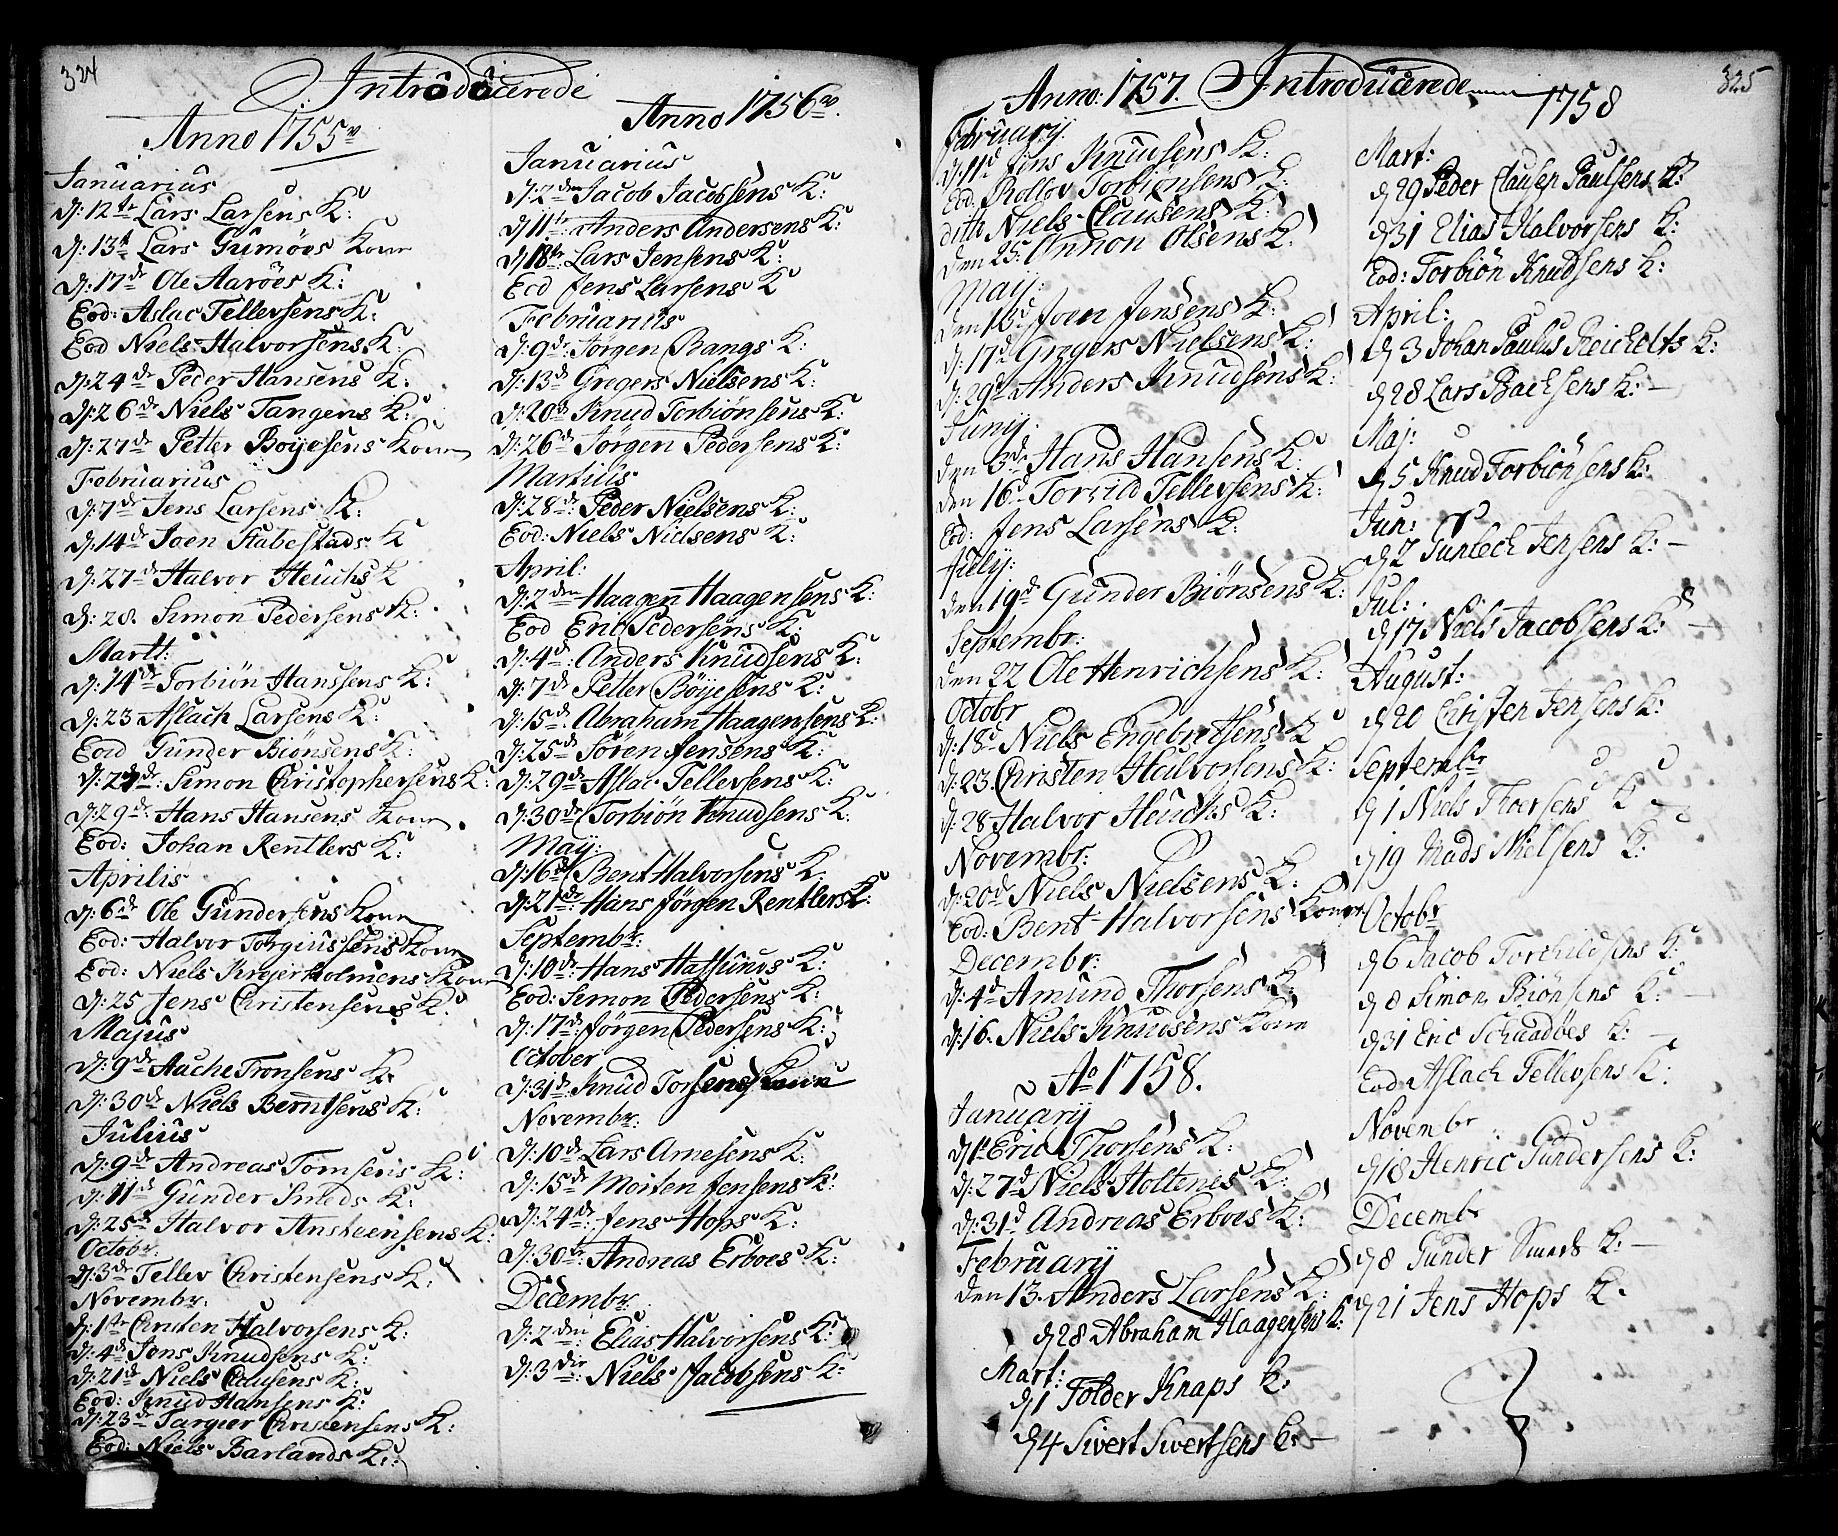 SAKO, Kragerø kirkebøker, F/Fa/L0001: Ministerialbok nr. 1, 1702-1766, s. 324-325